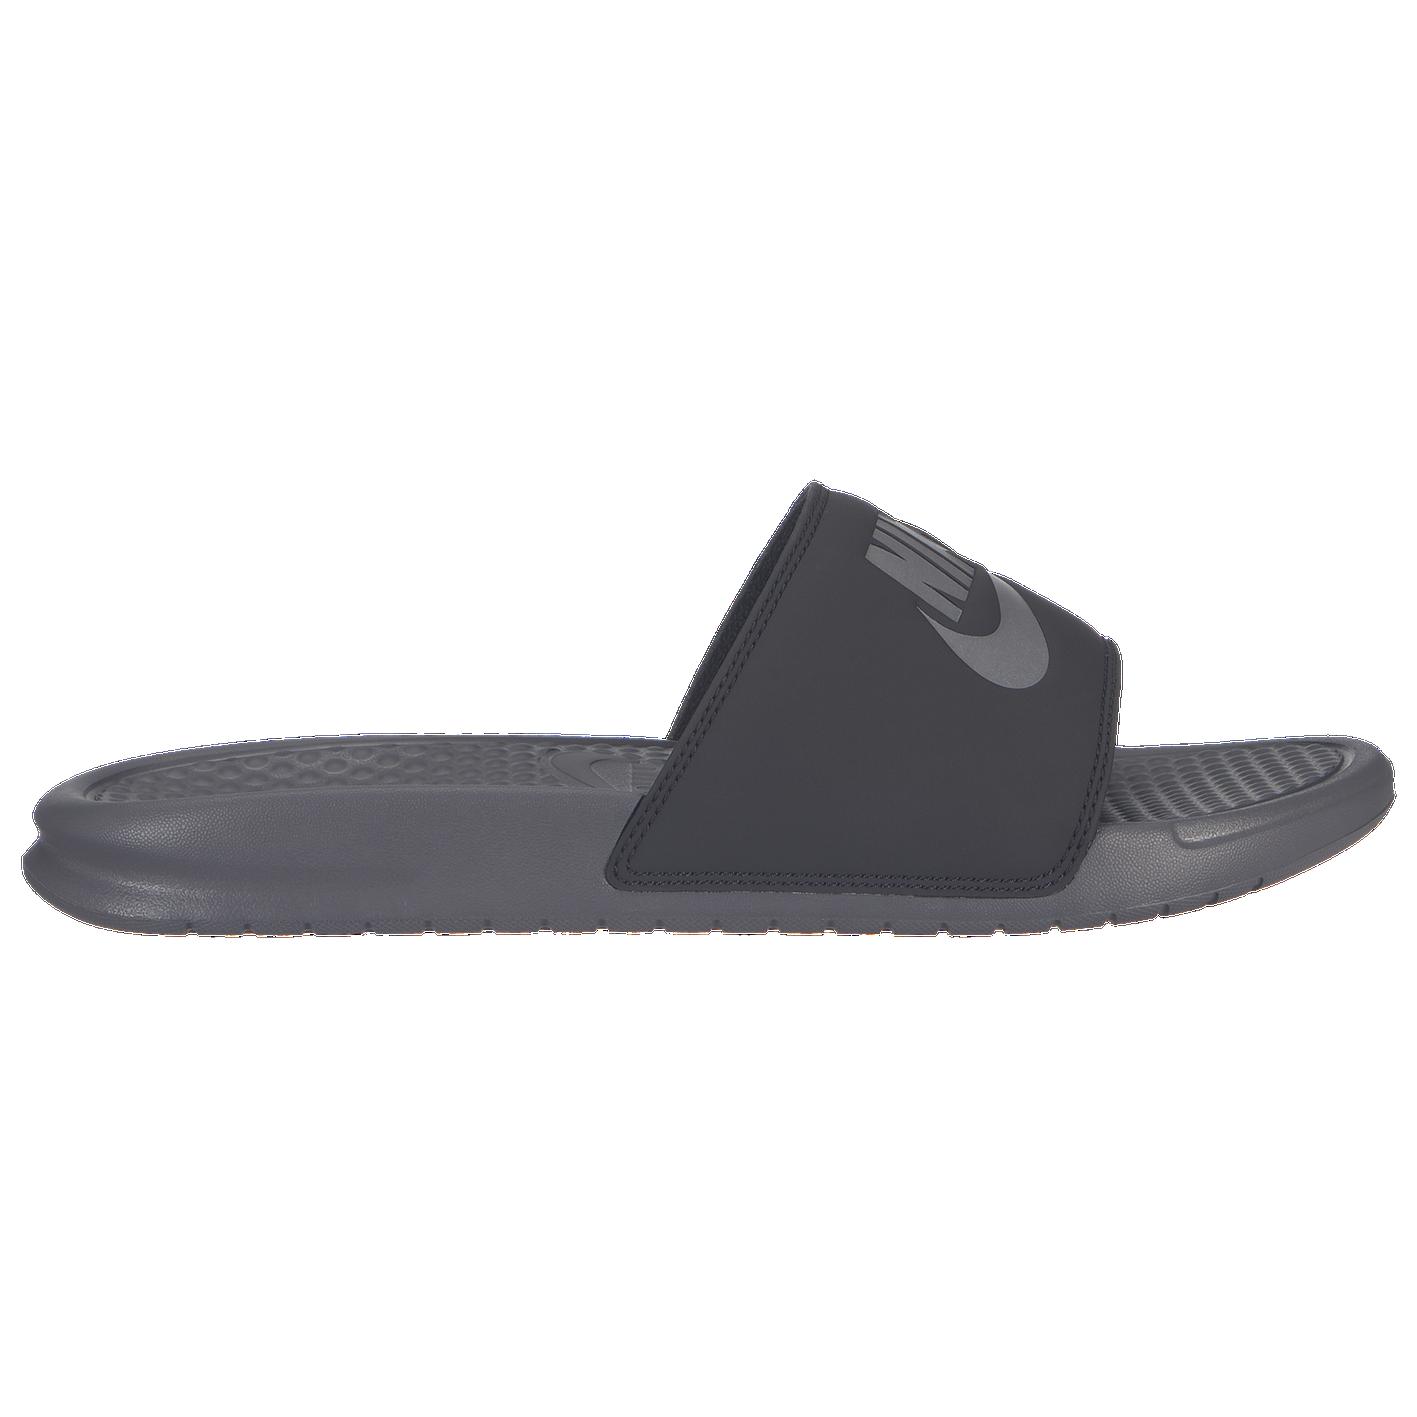 2d6419ebef48 Nike Benassi JDI Slide - Men s - Casual - Shoes - Gunsmoke Gunsmoke Oil Grey